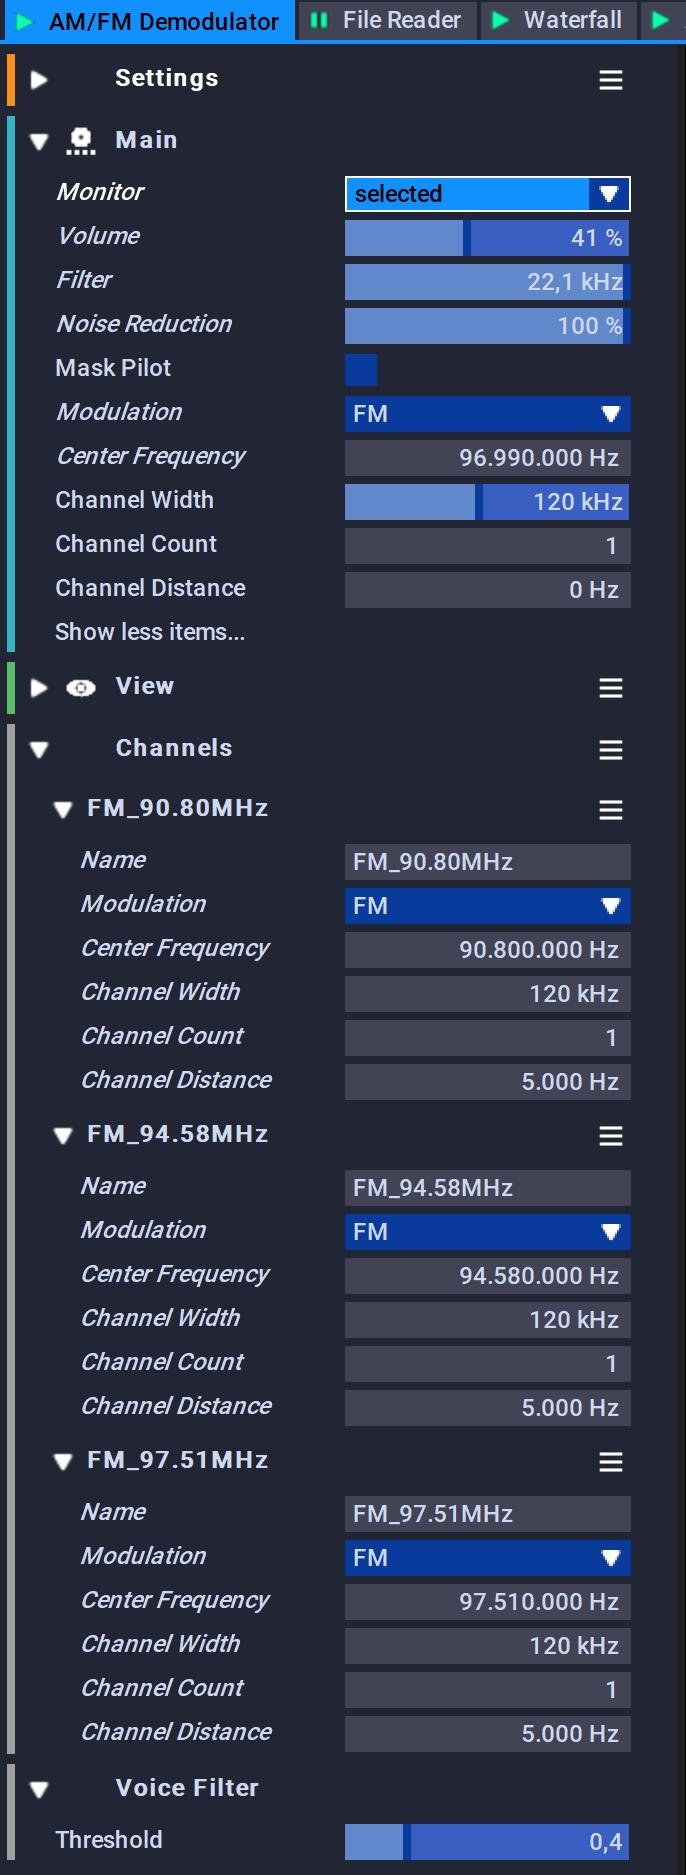 AM / FM Demodulator Settings